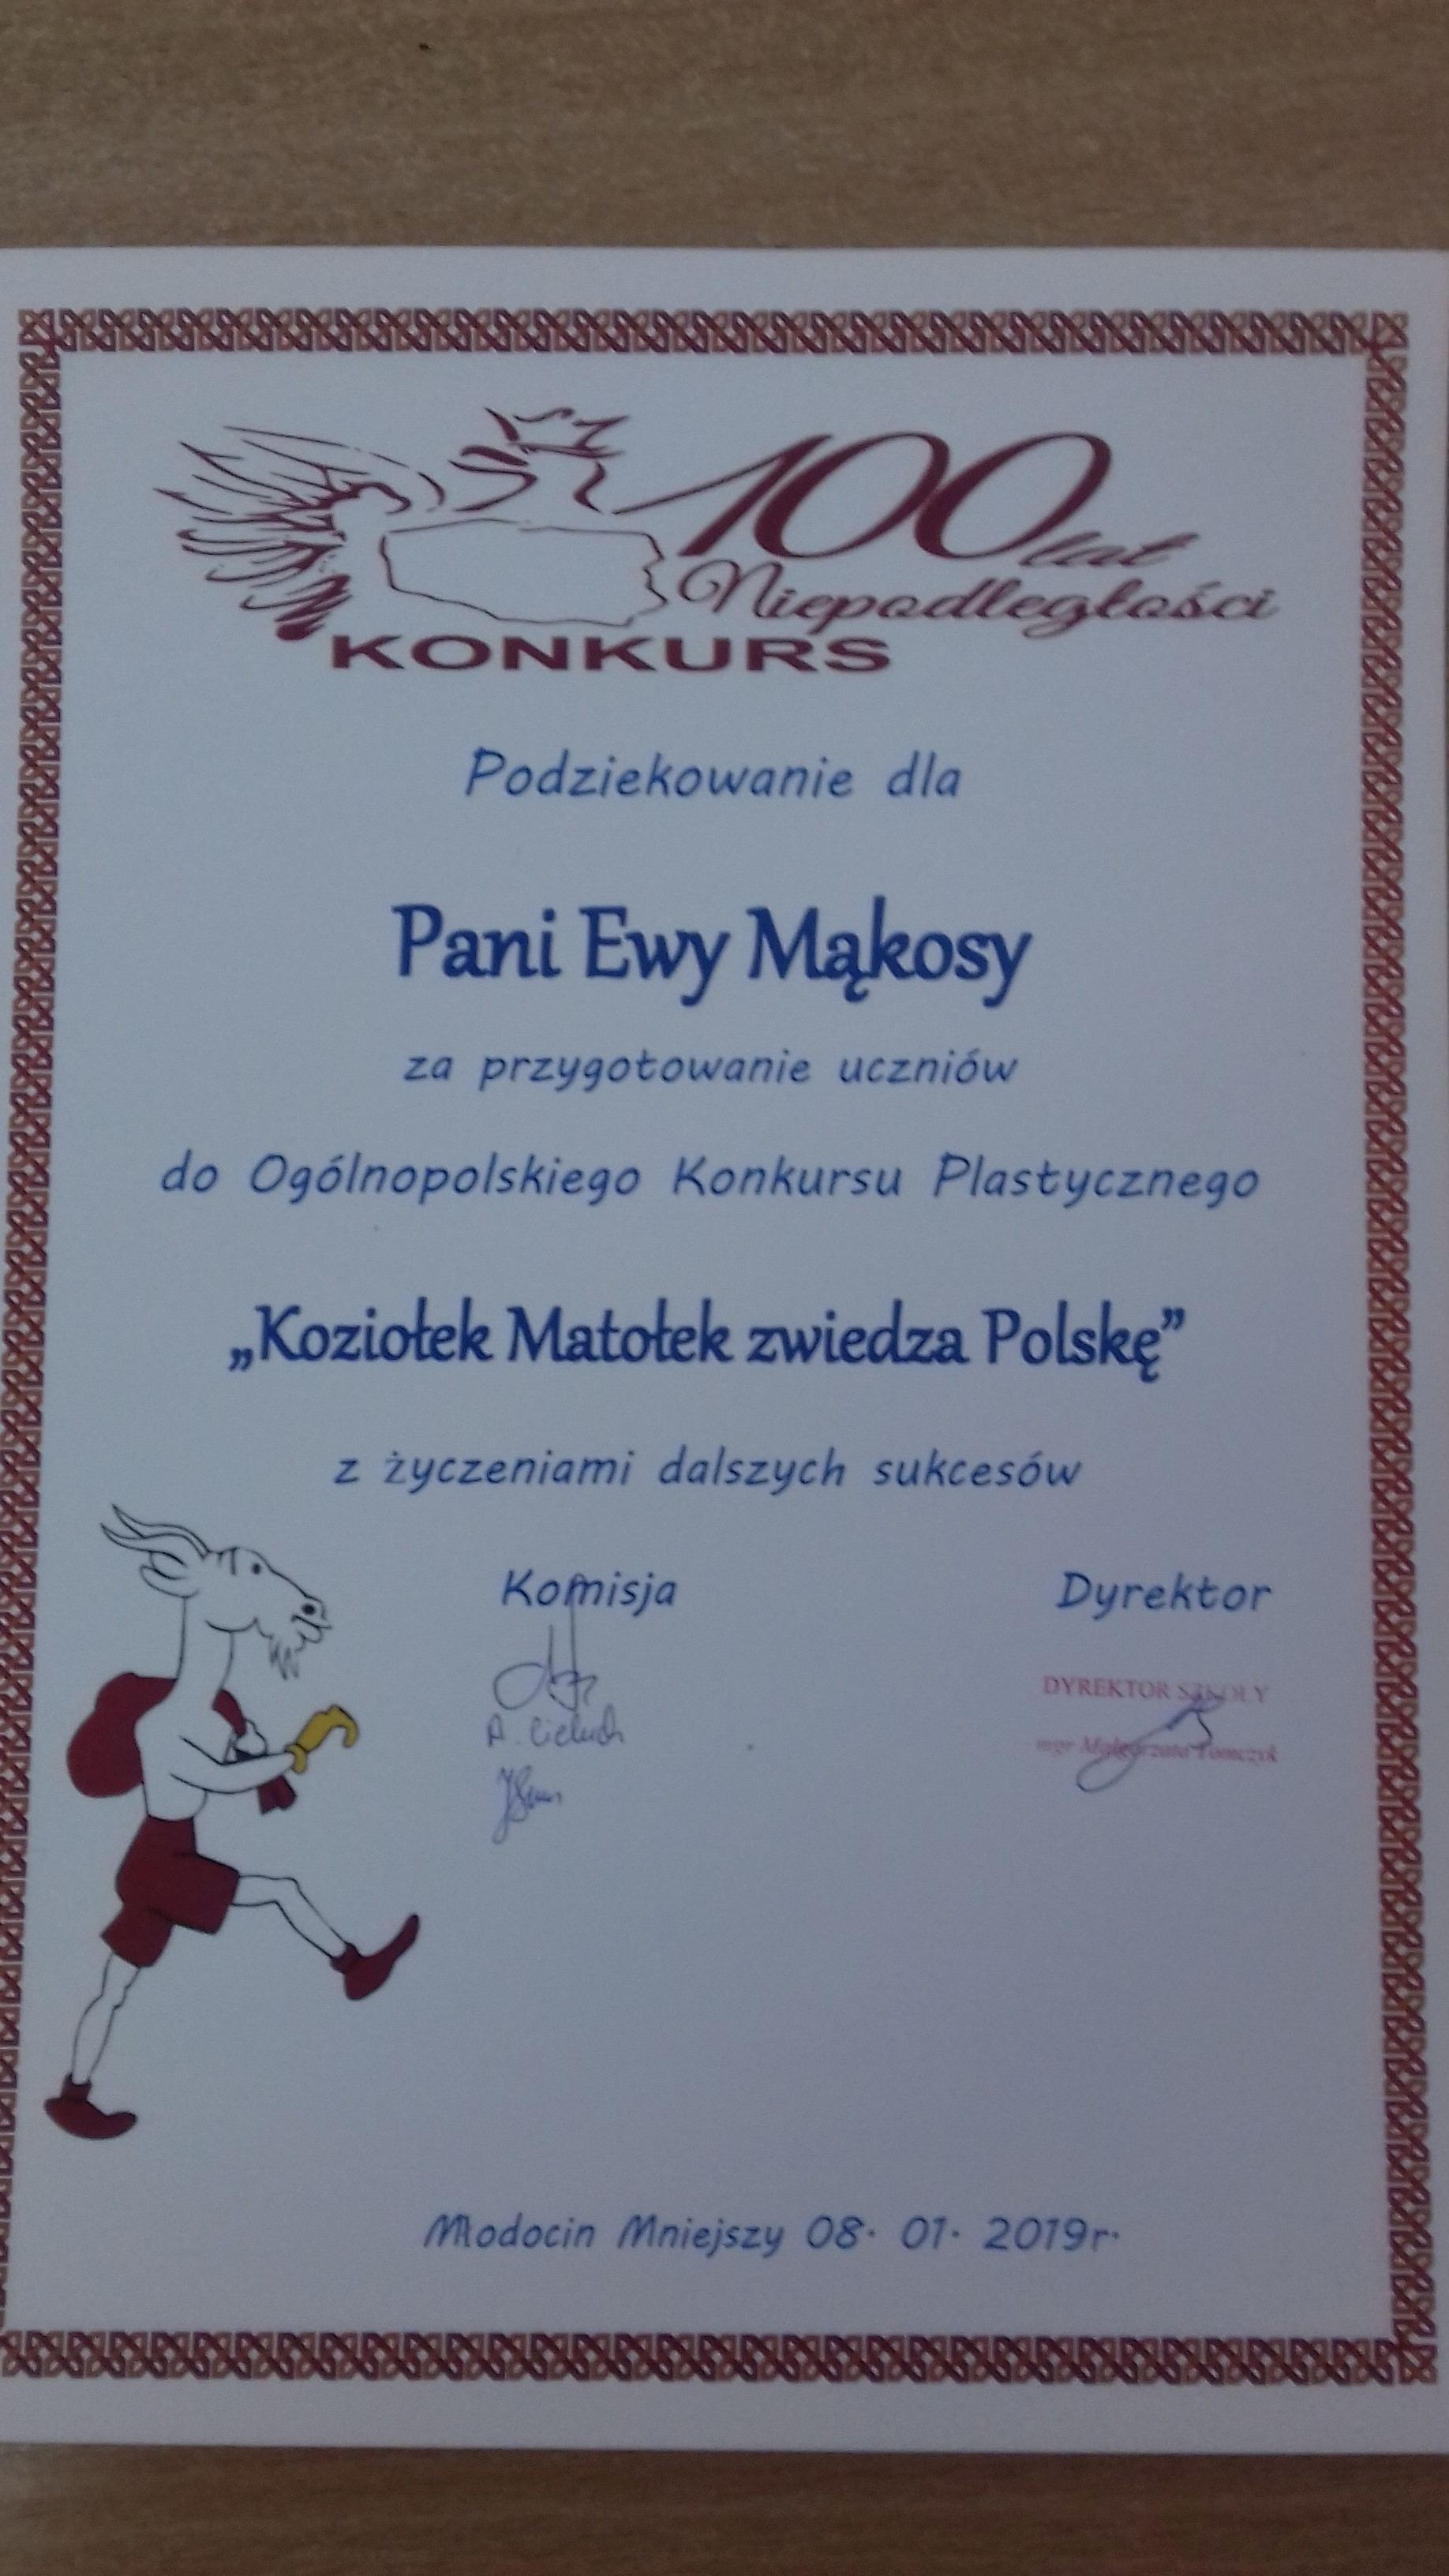 koziolek005